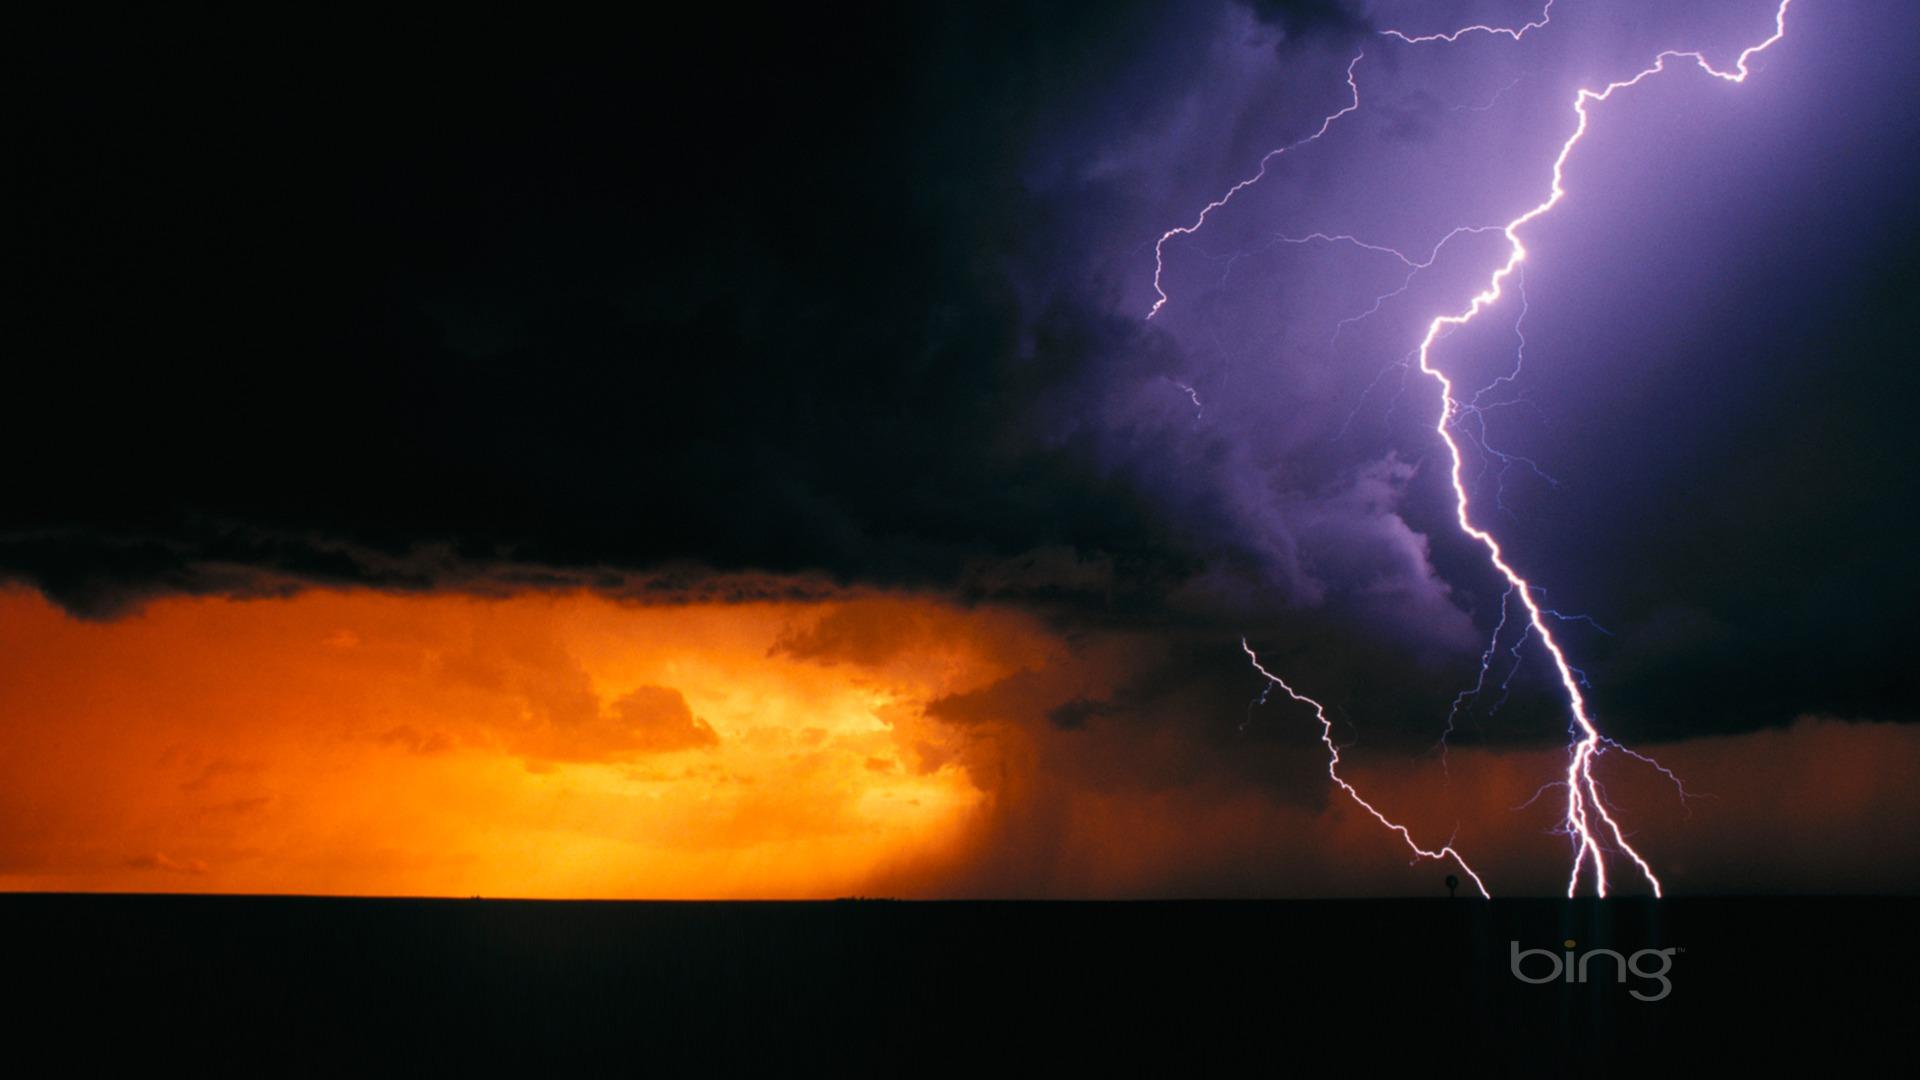 Texas the day of Lightning Bing Wallpaper Full HD Desktop Wallpaper 1920x1080